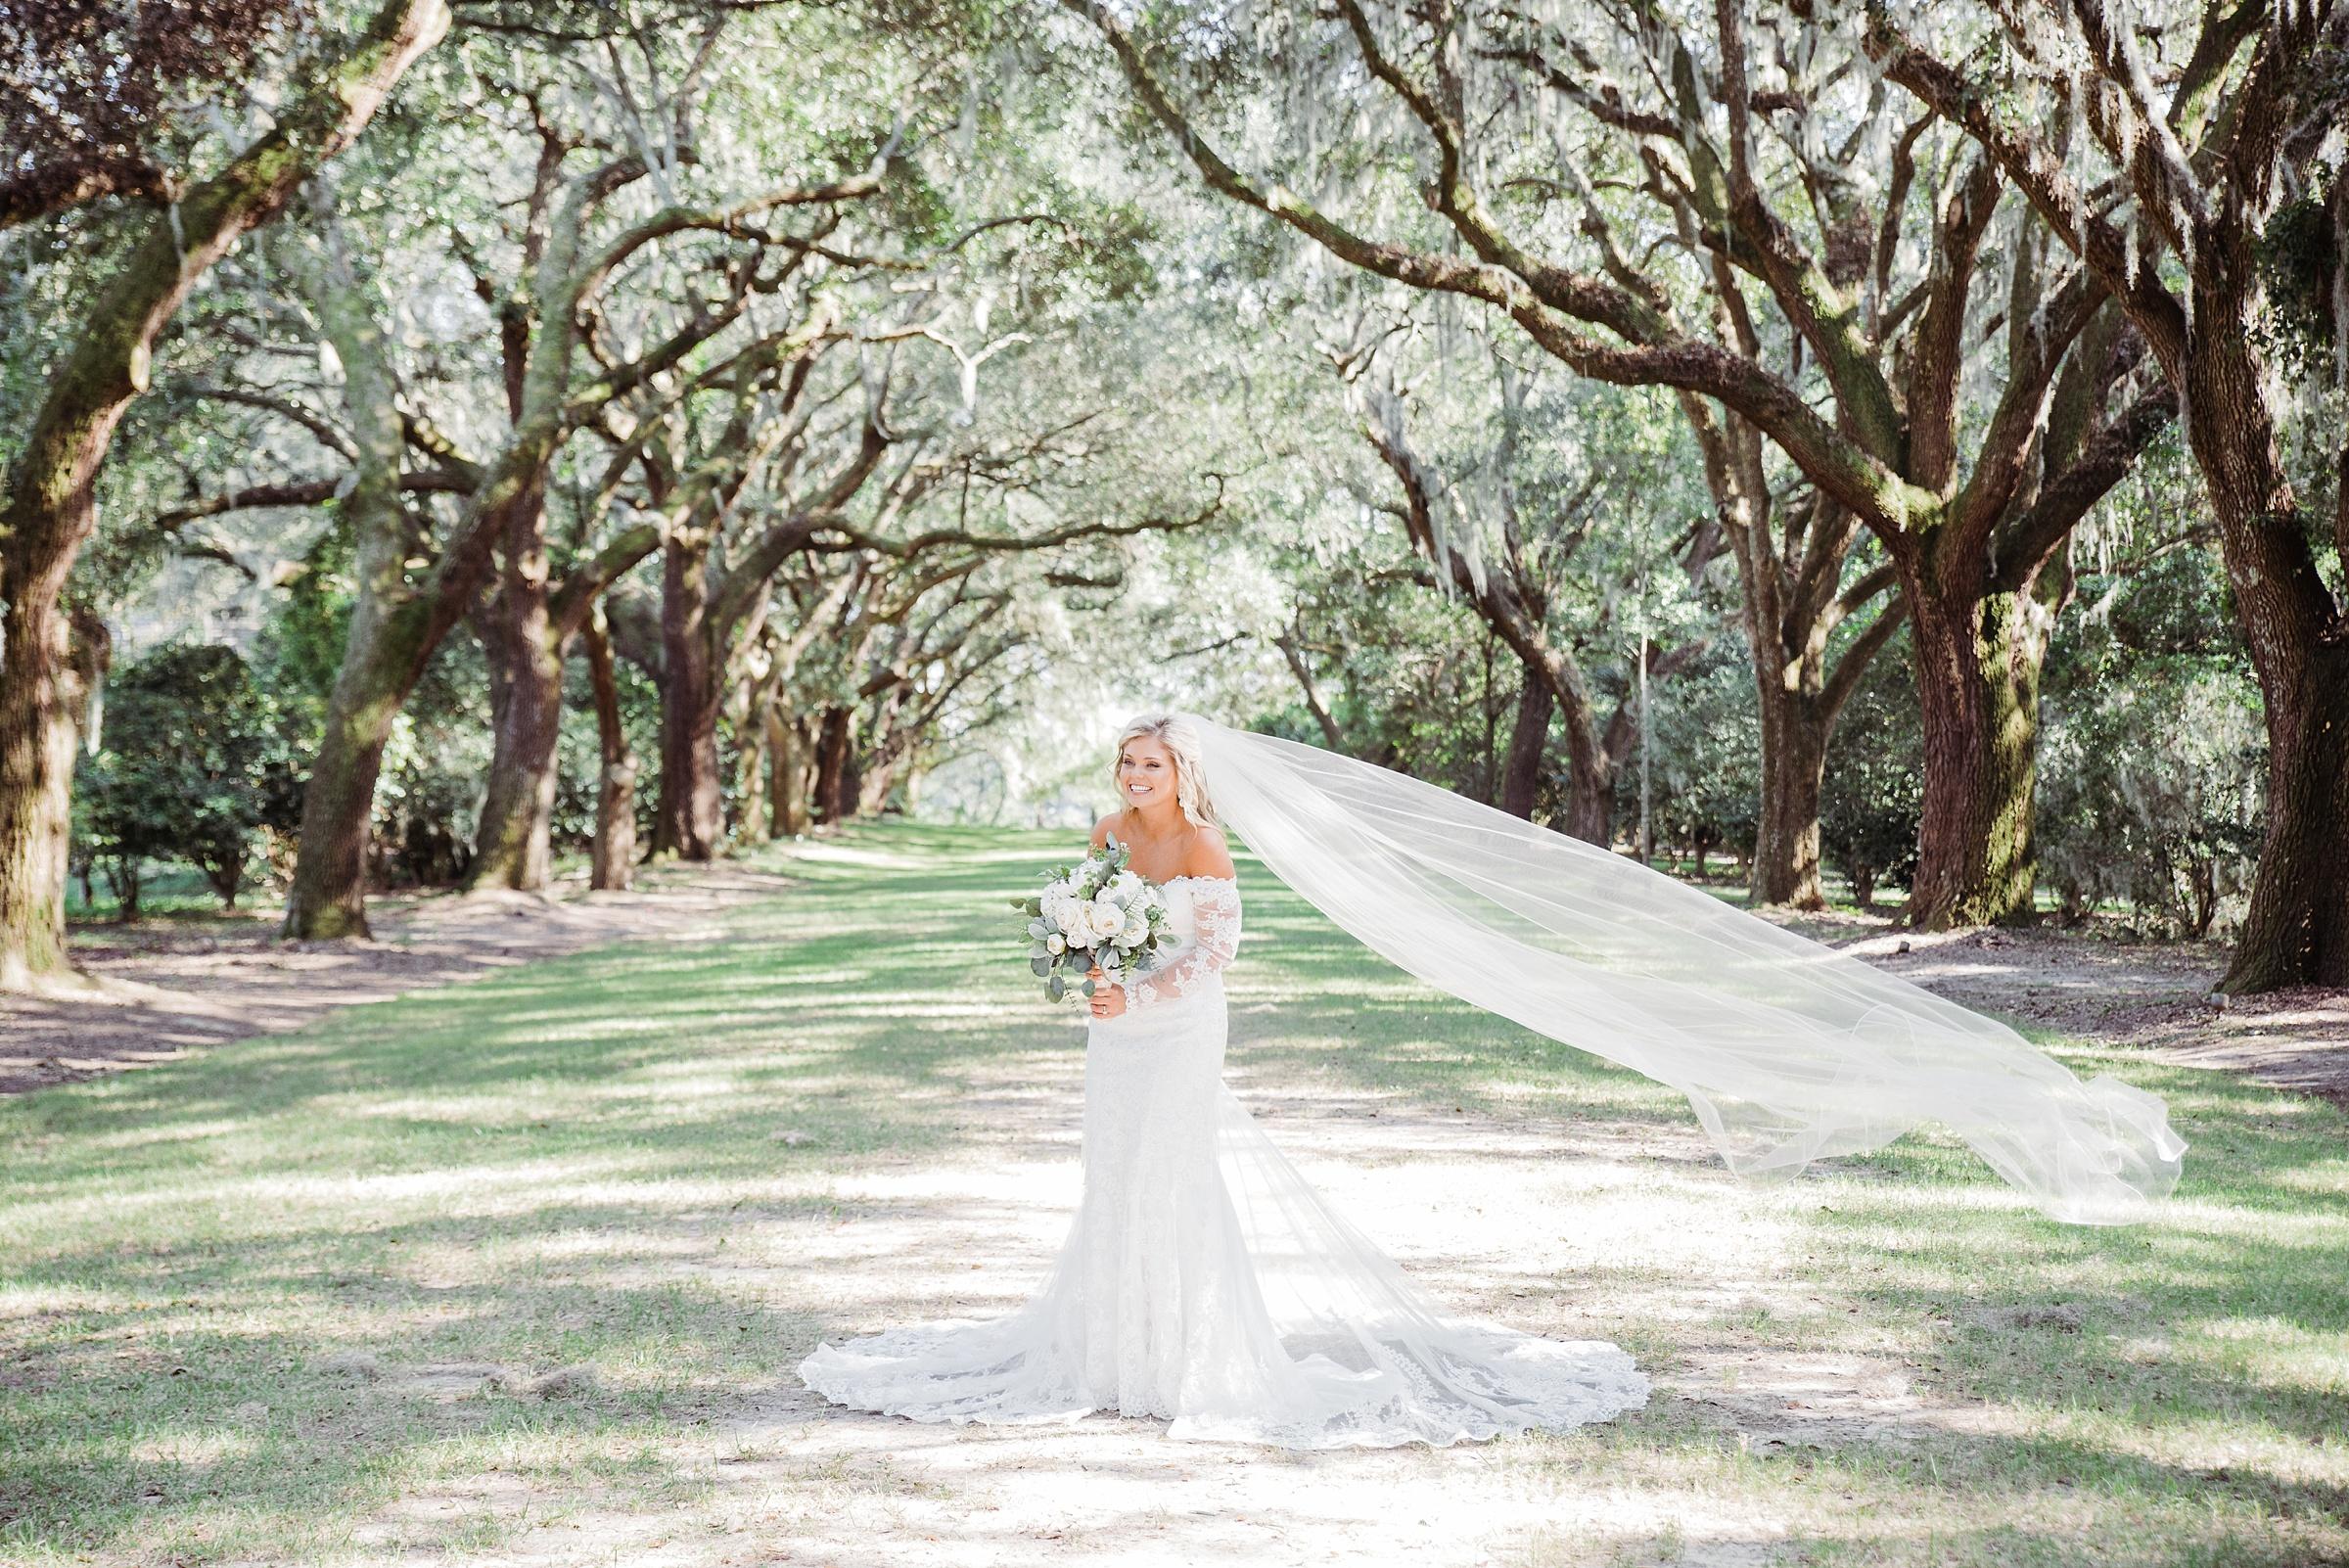 charleston sc bridal portrait session legare waring house wedding photographer spanish moss bridal portraits oak trees